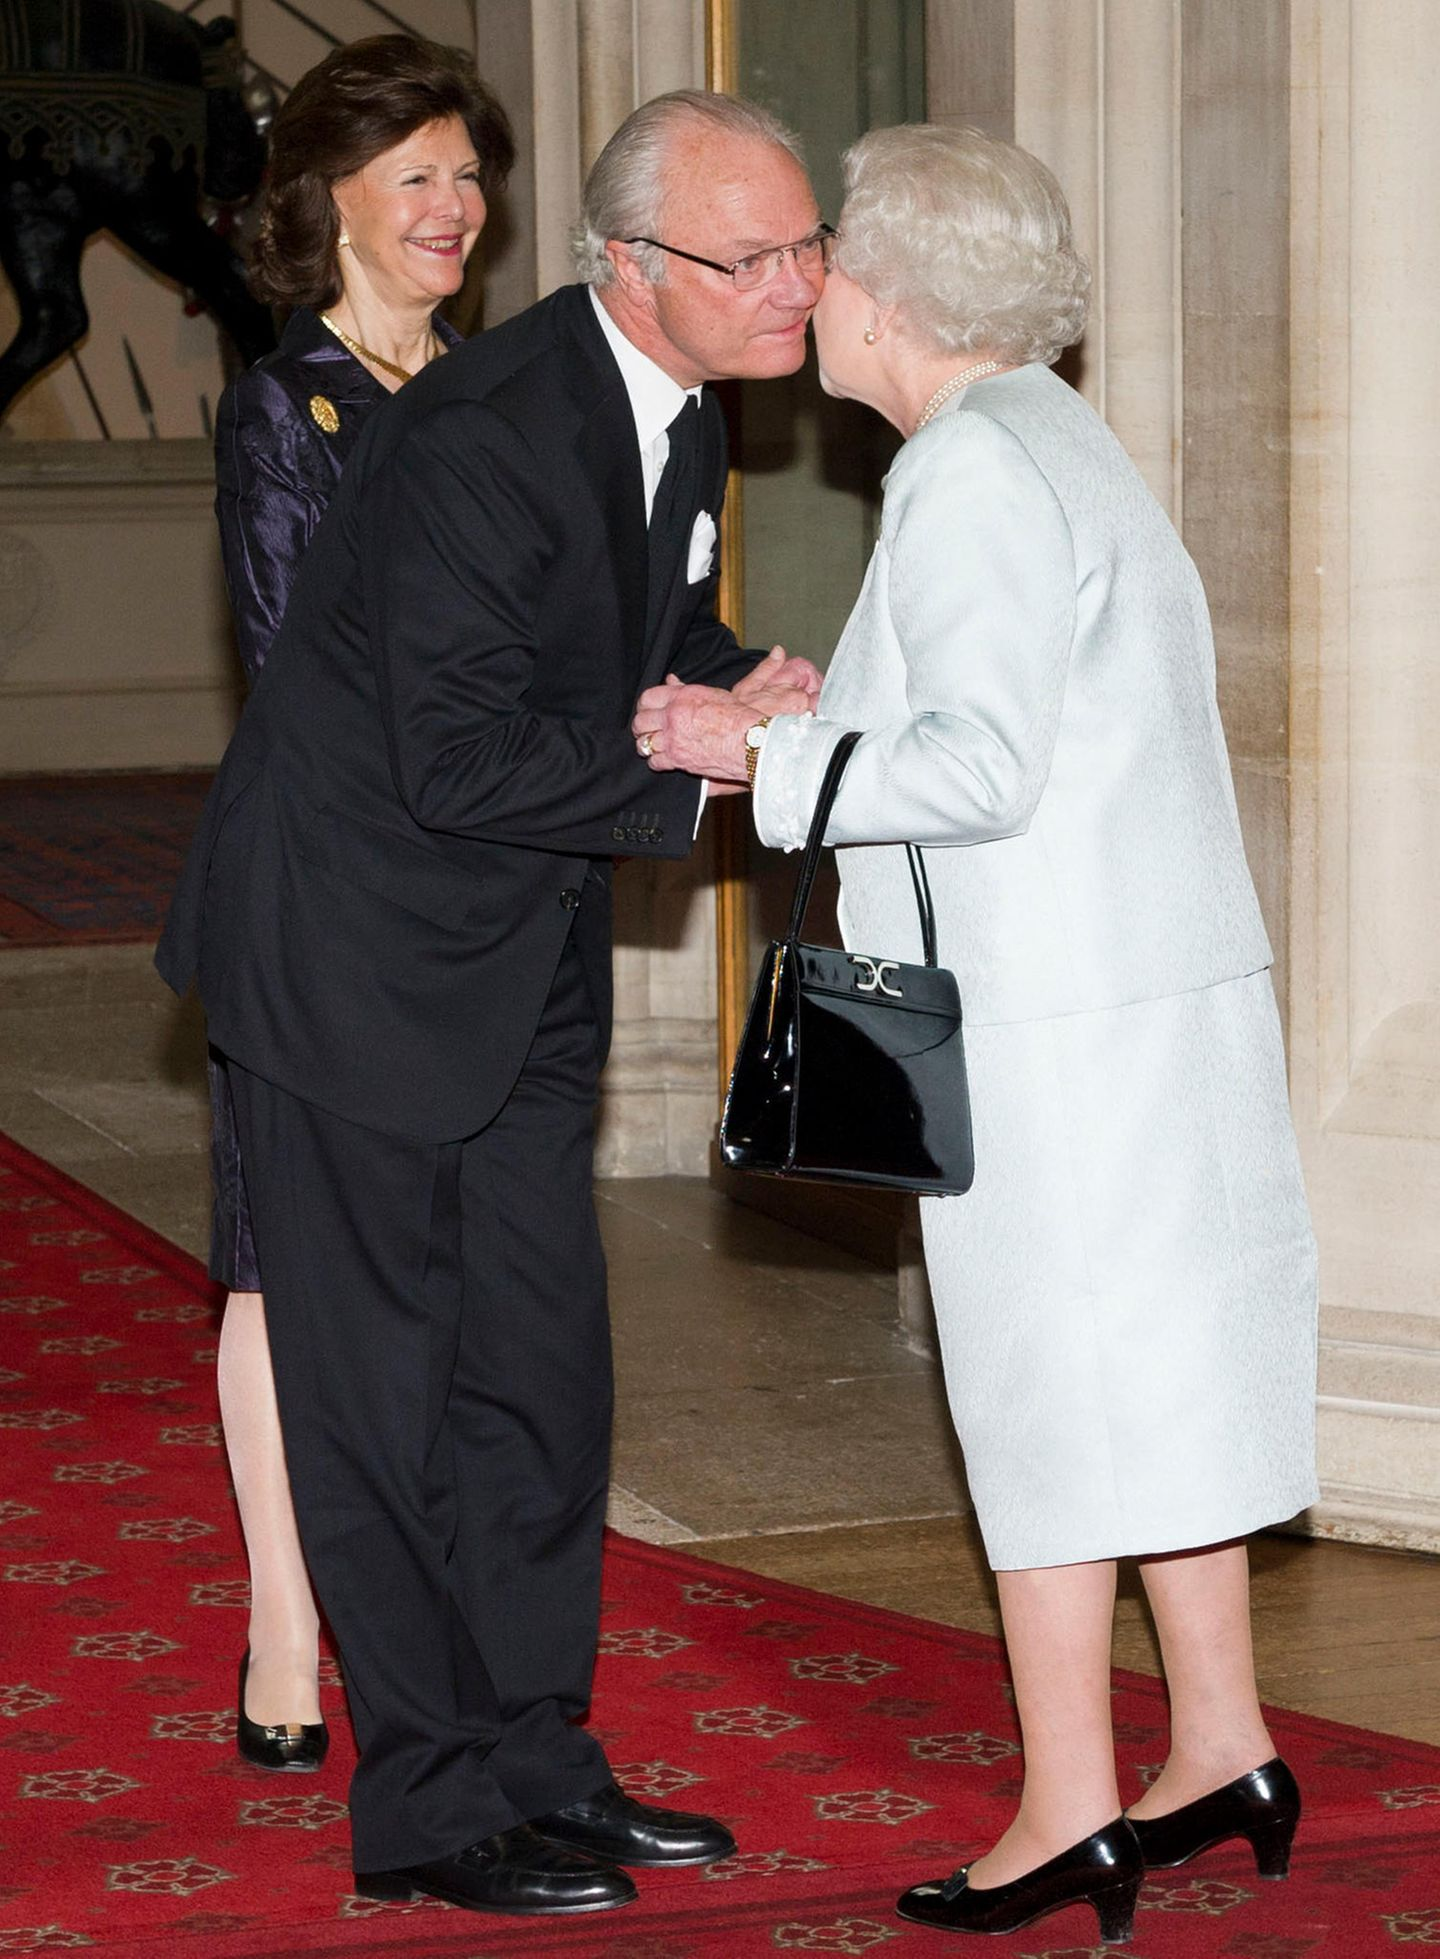 Königin Silvia, König Carl Gustaf, Queen Elizabeth